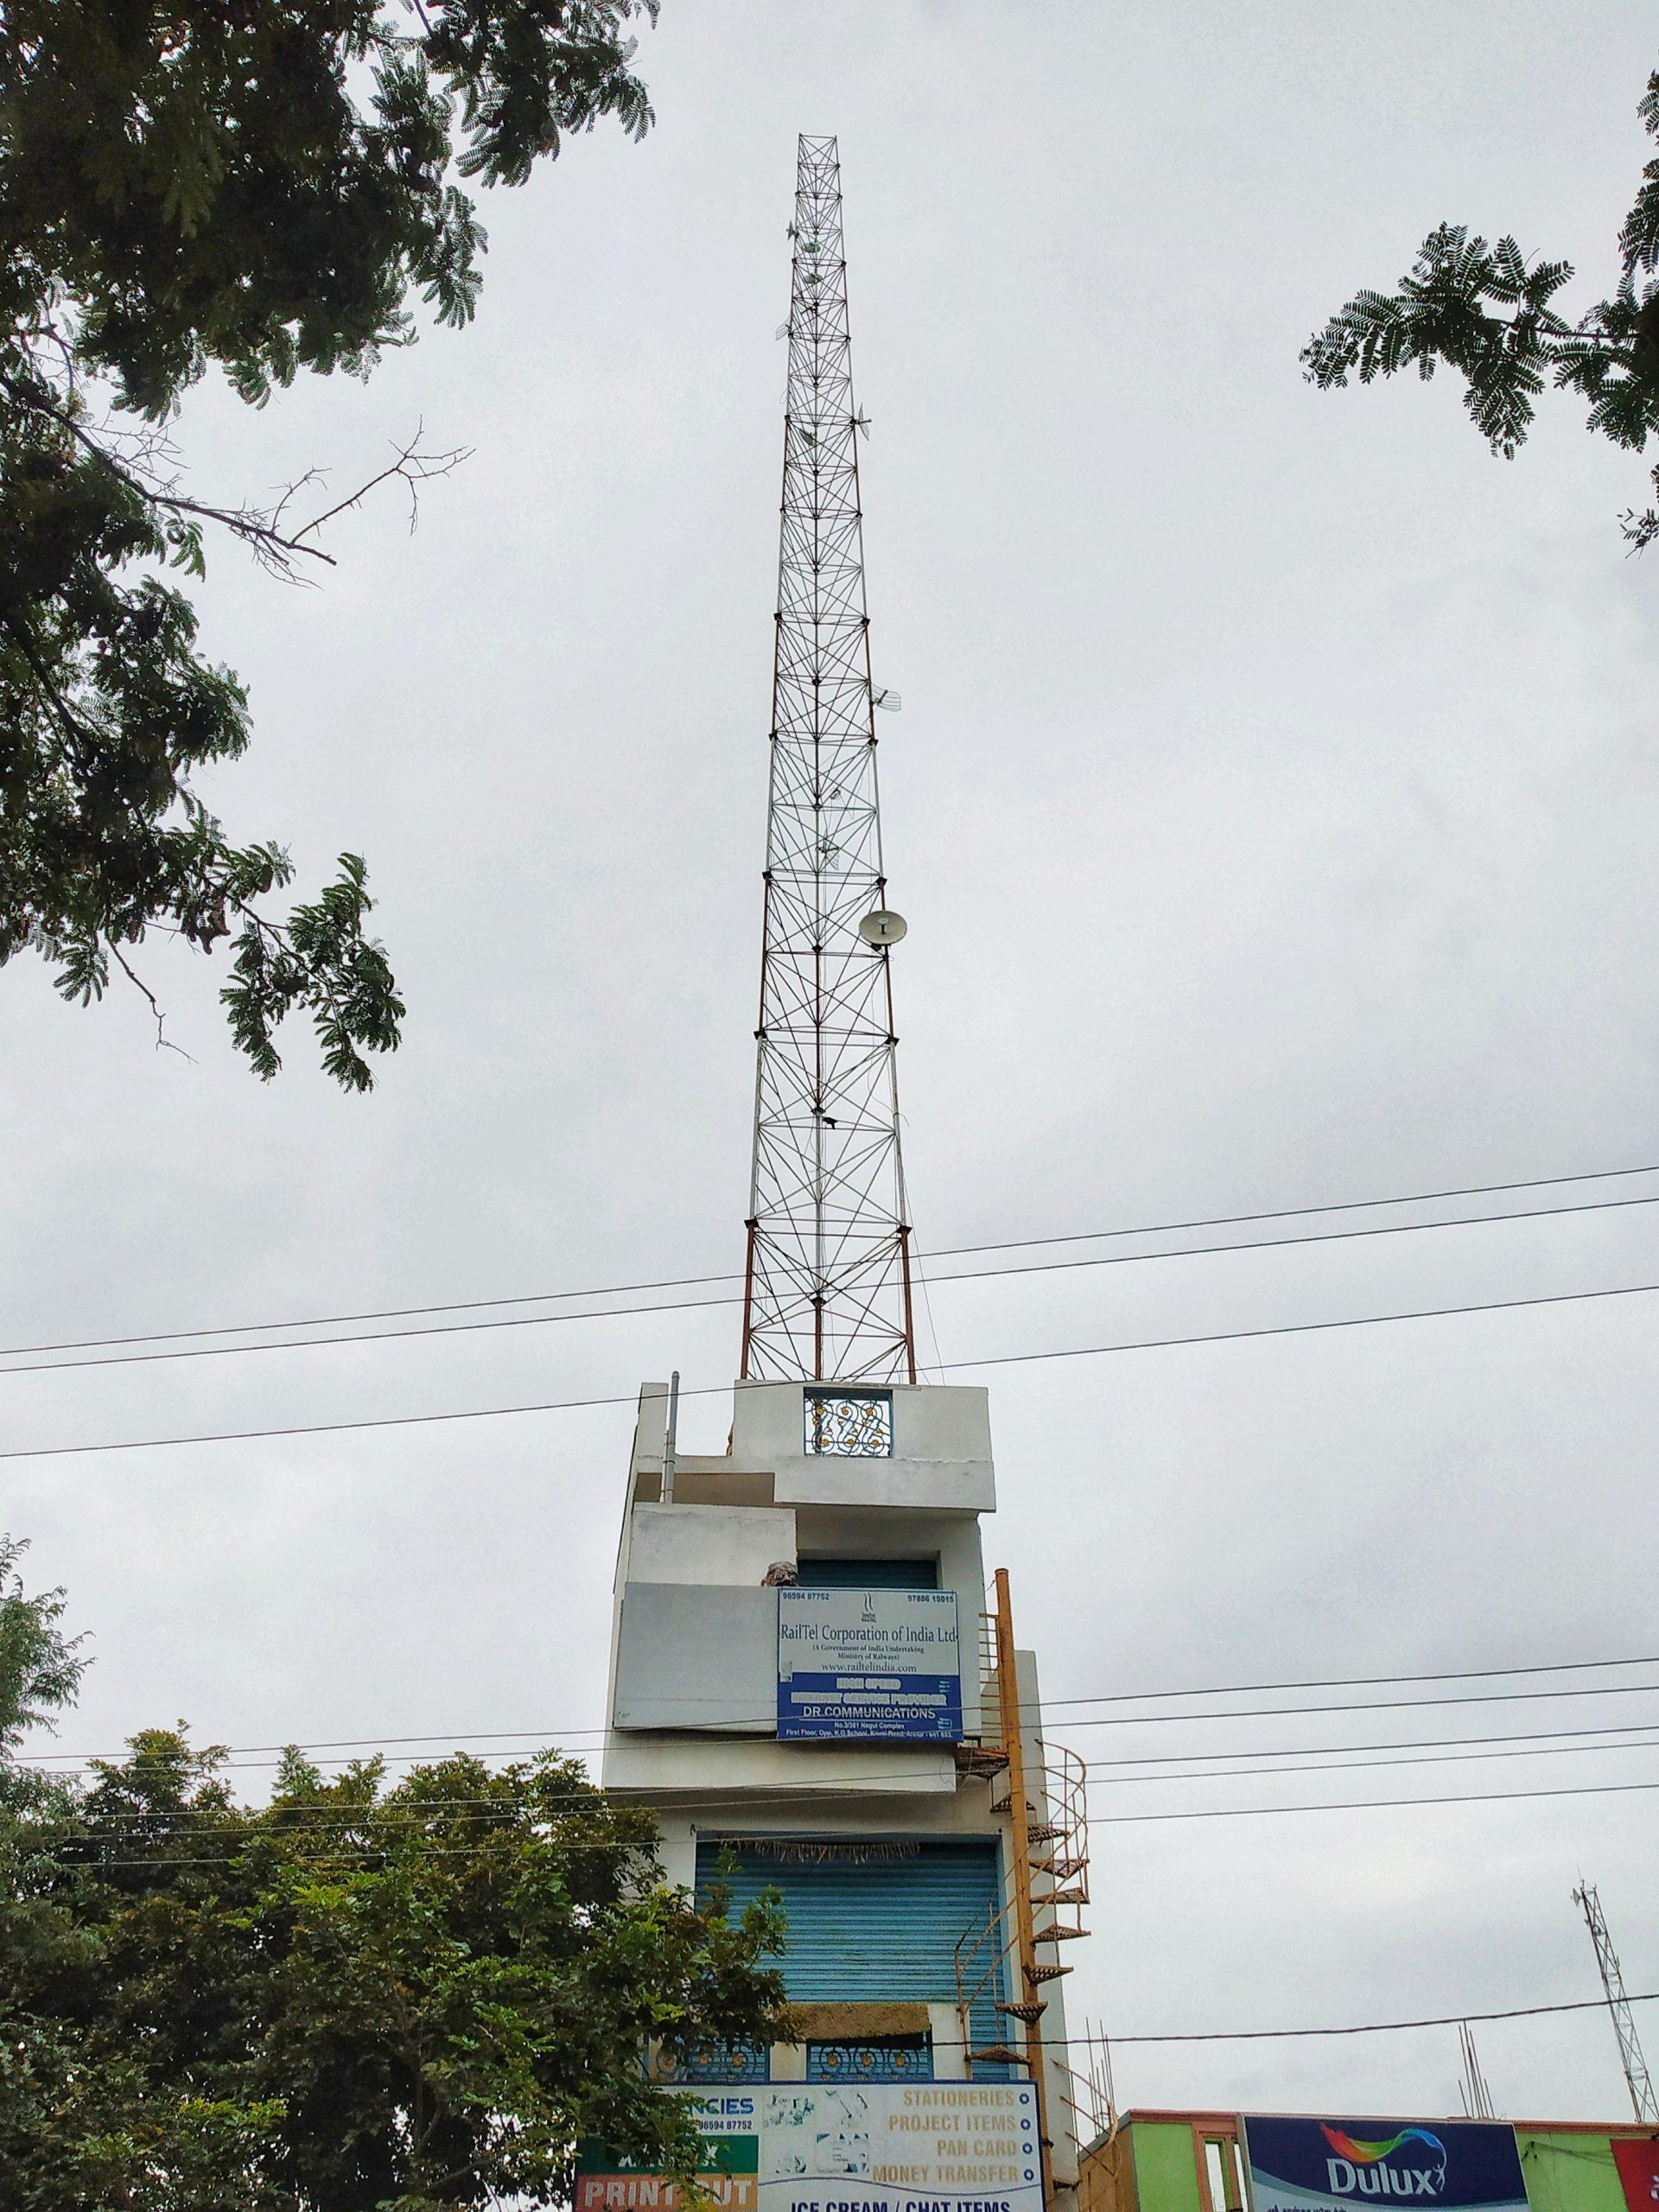 A telecom tower on a building